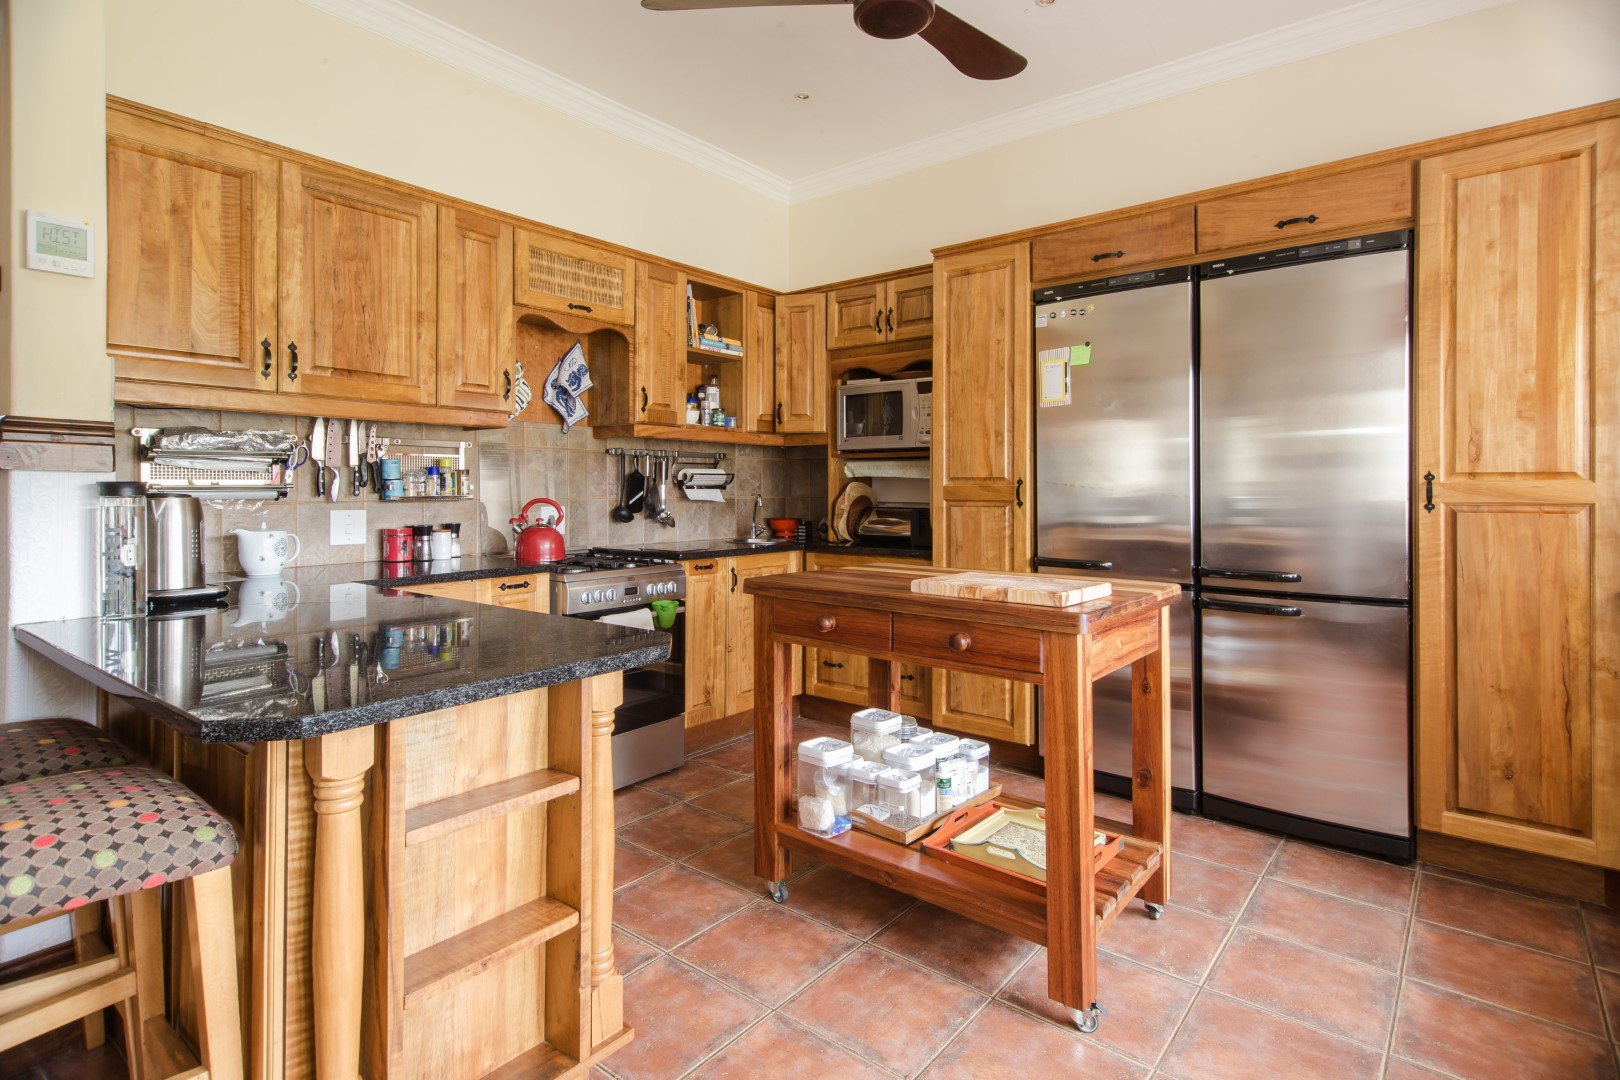 Uniondale, 6600, 5 Bedrooms Bedrooms, ,4 BathroomsBathrooms,Villa,For Sale,1079